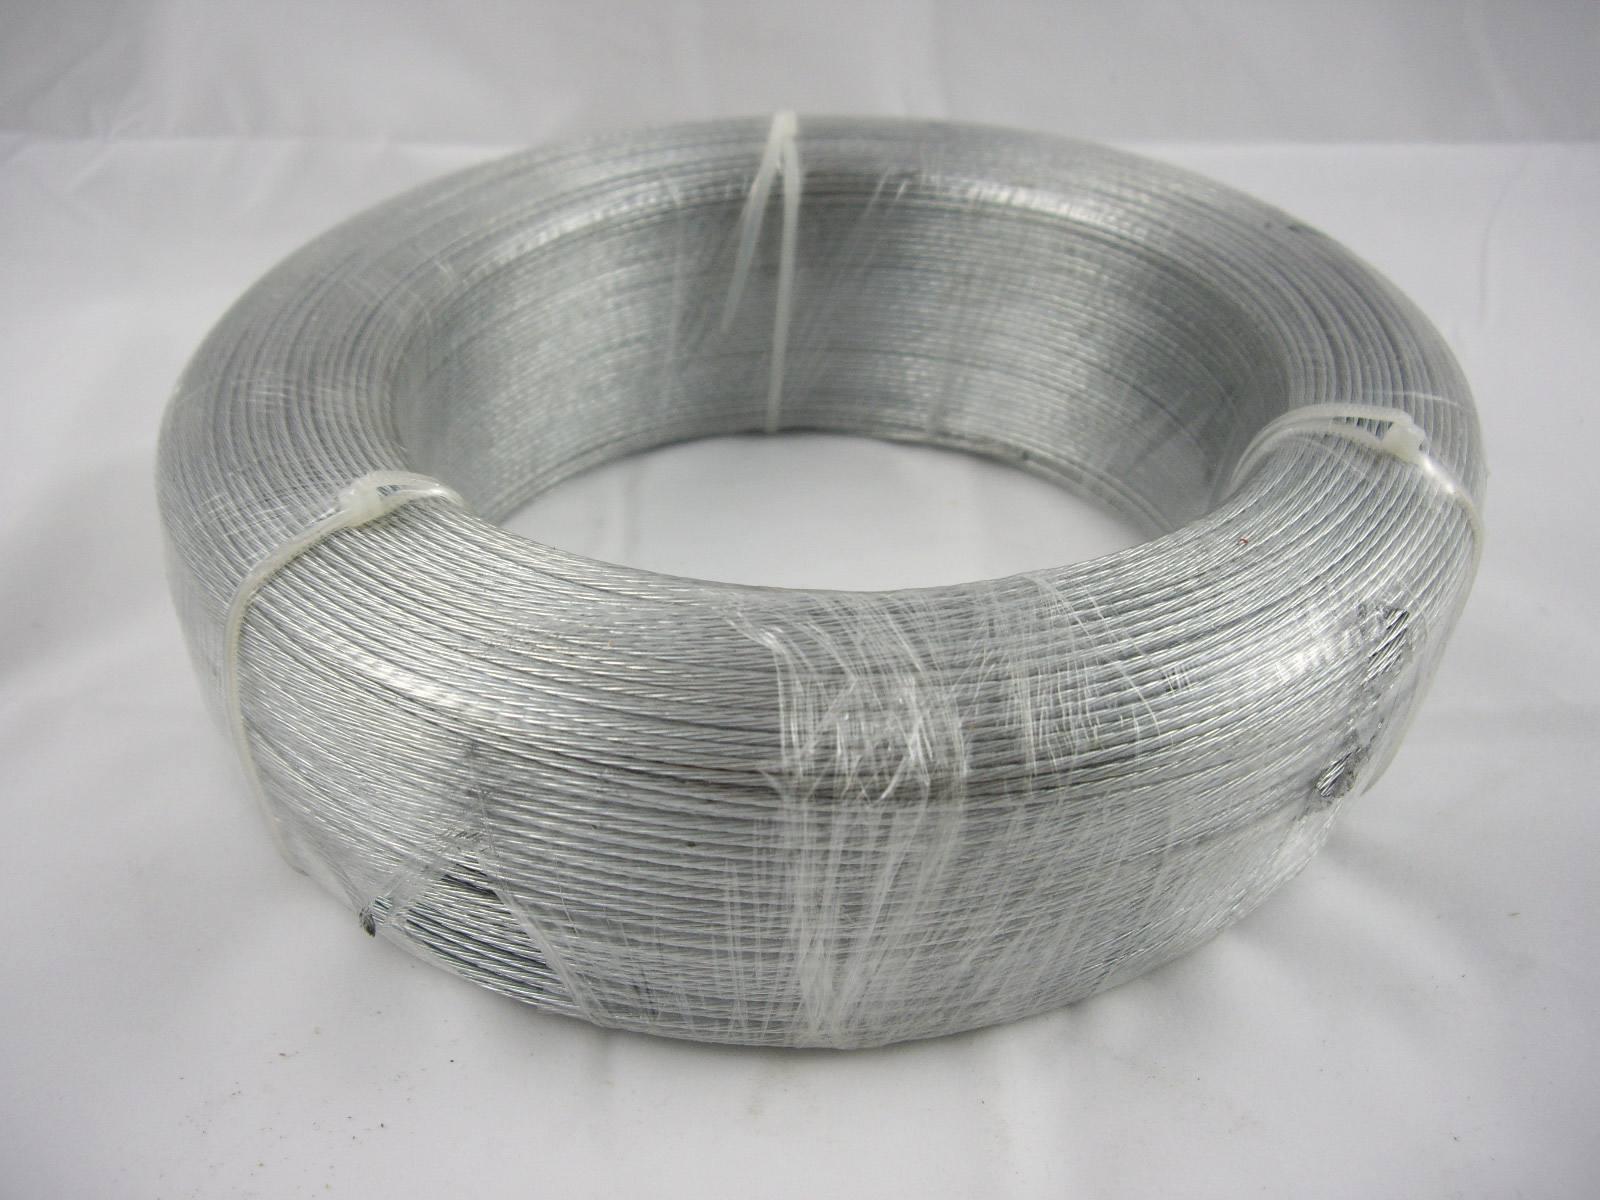 Drahtlitze 500 m x 1,5 mm, Litzen gebündelt - Draht für Weidezäune